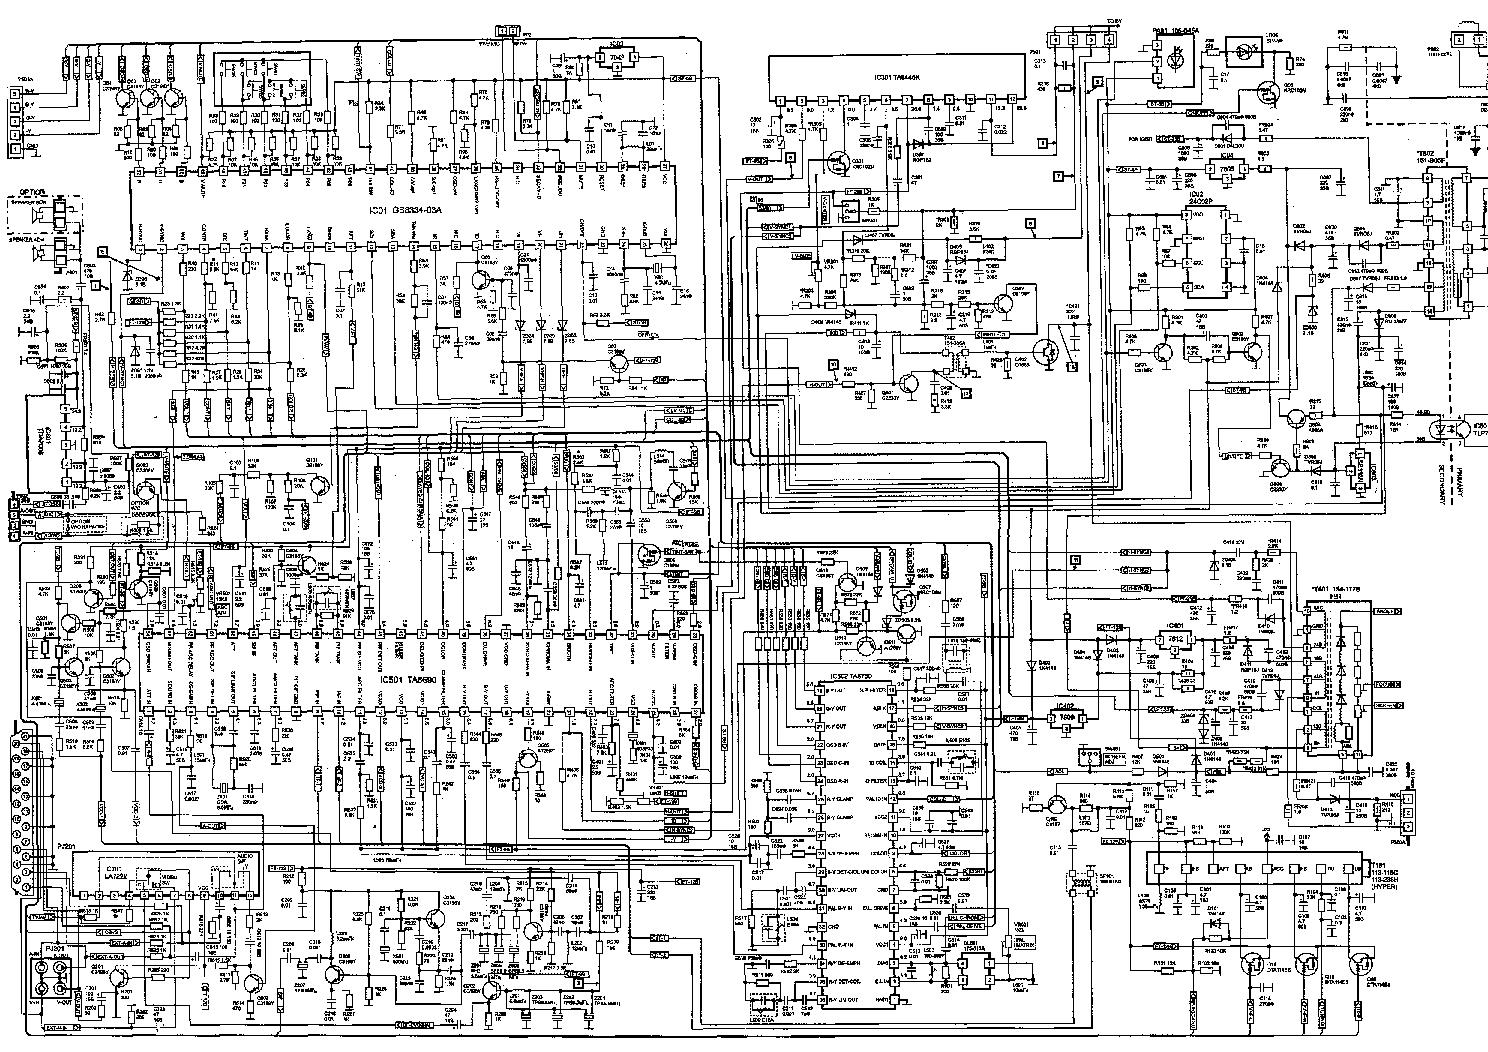 GOLDSTAR CF-14E20B SCH service manual (1st page)